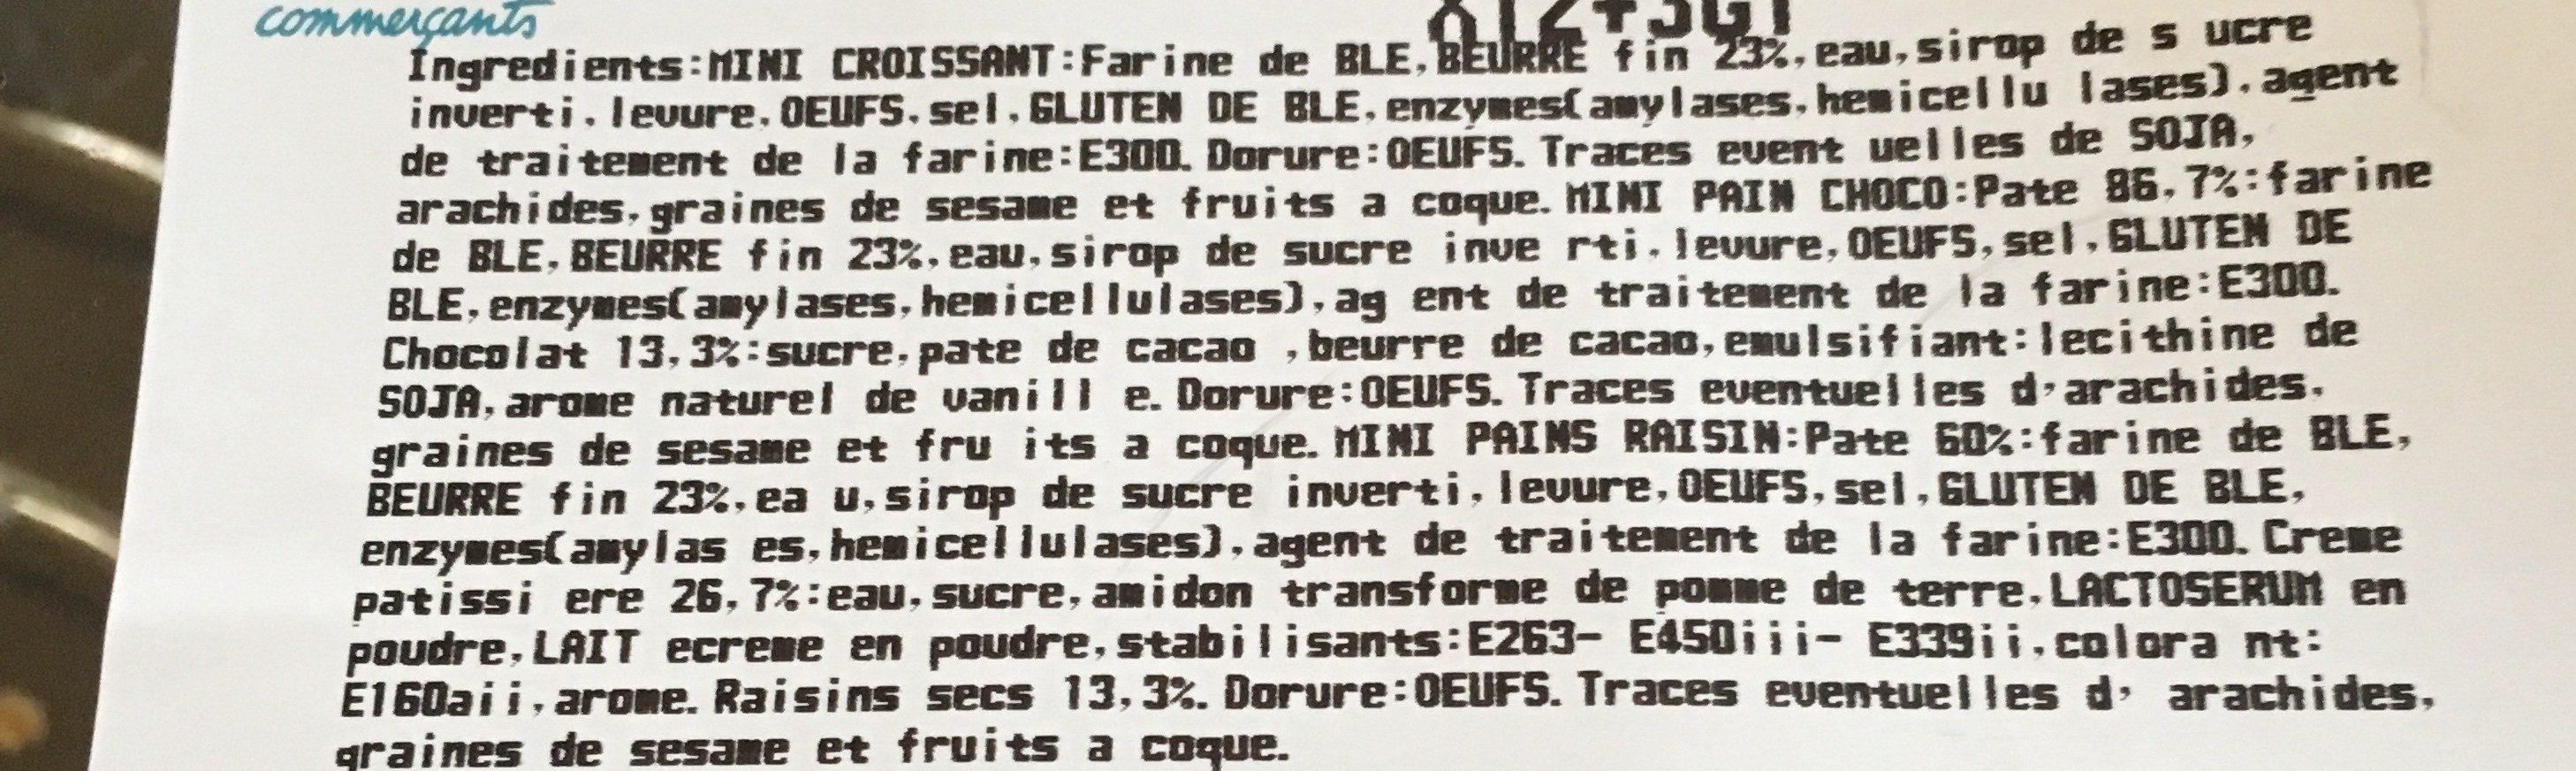 Assortiment mini viennoiserie pur beurre U - Ingredients